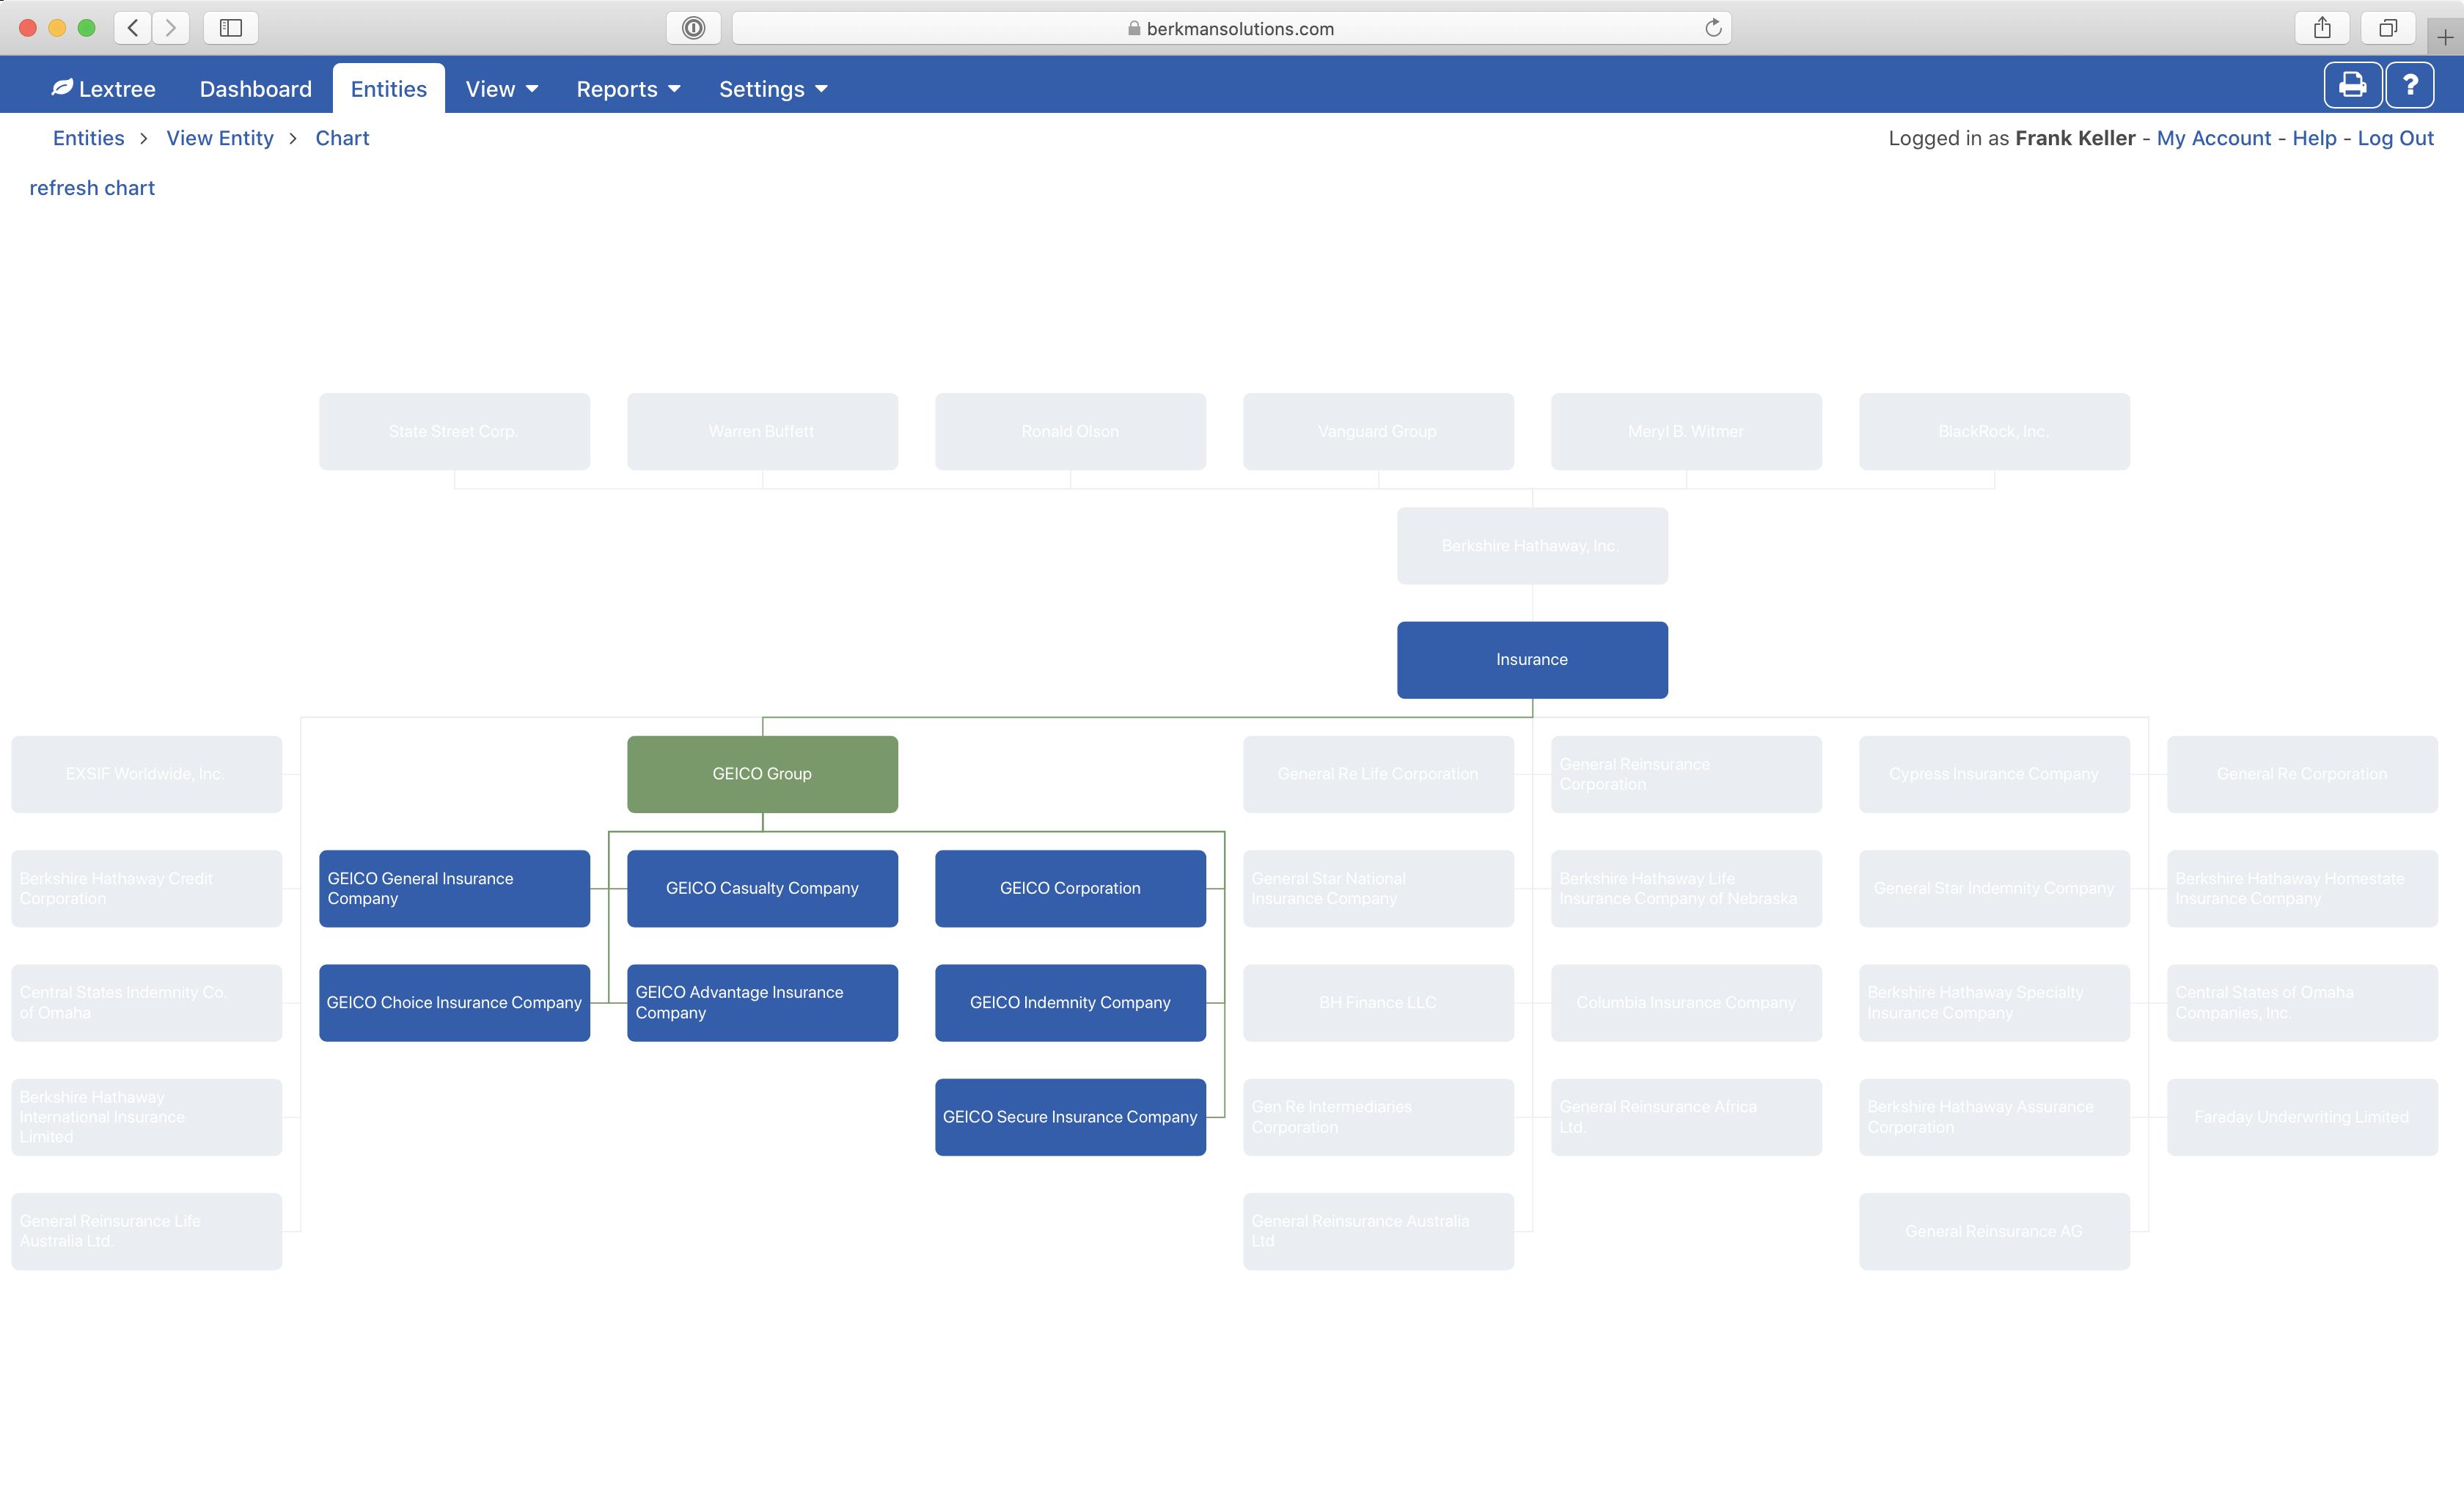 Organizational structure using business segment